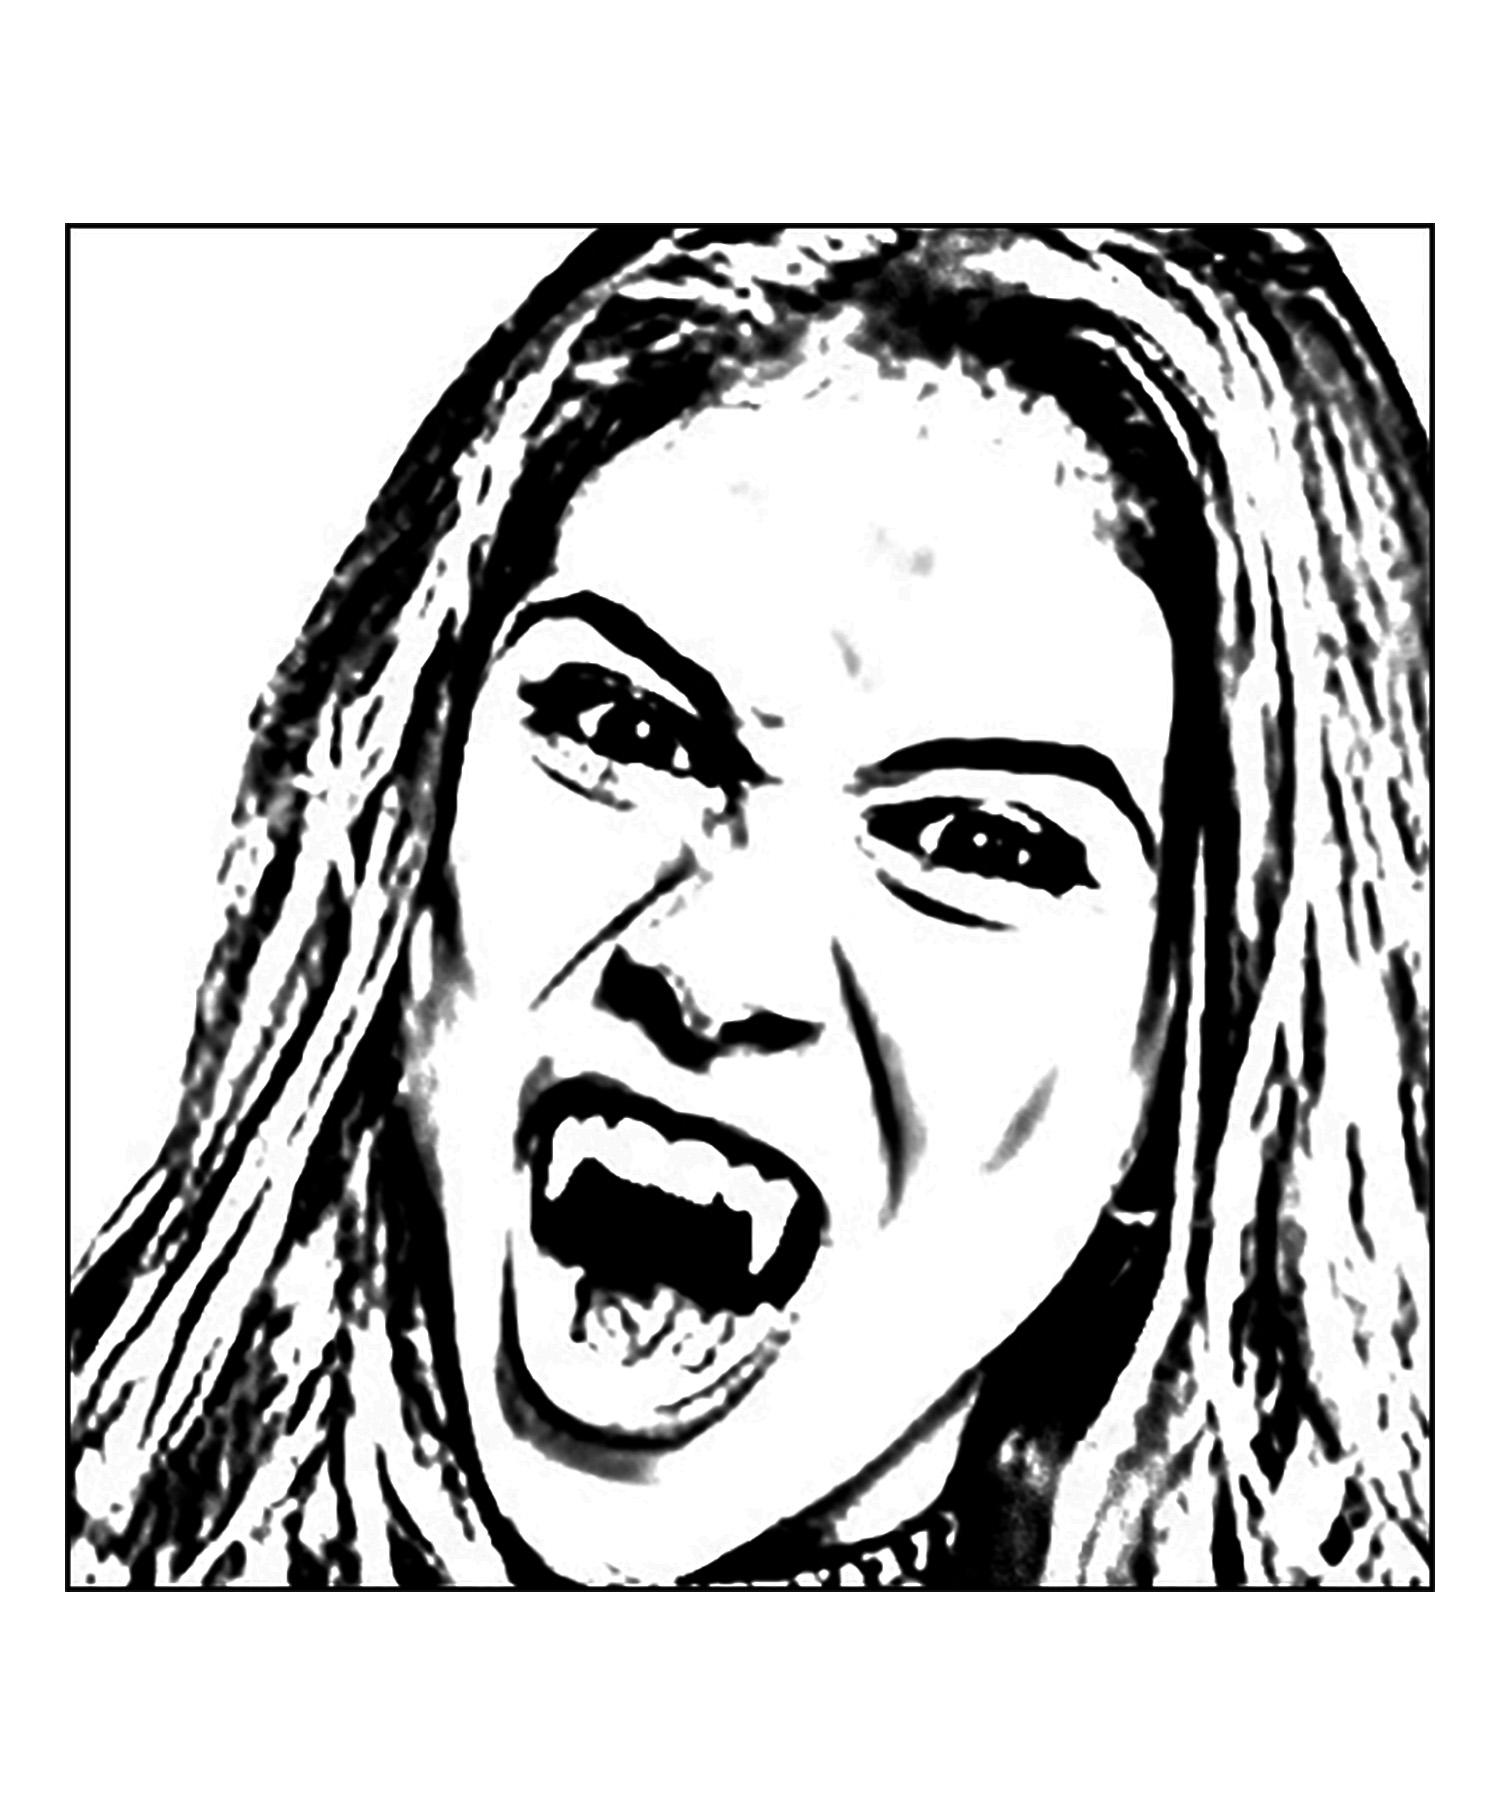 Chica vampiro daisy zoom visage coloriage chica vampiro - Coloriage chica vampiro ...